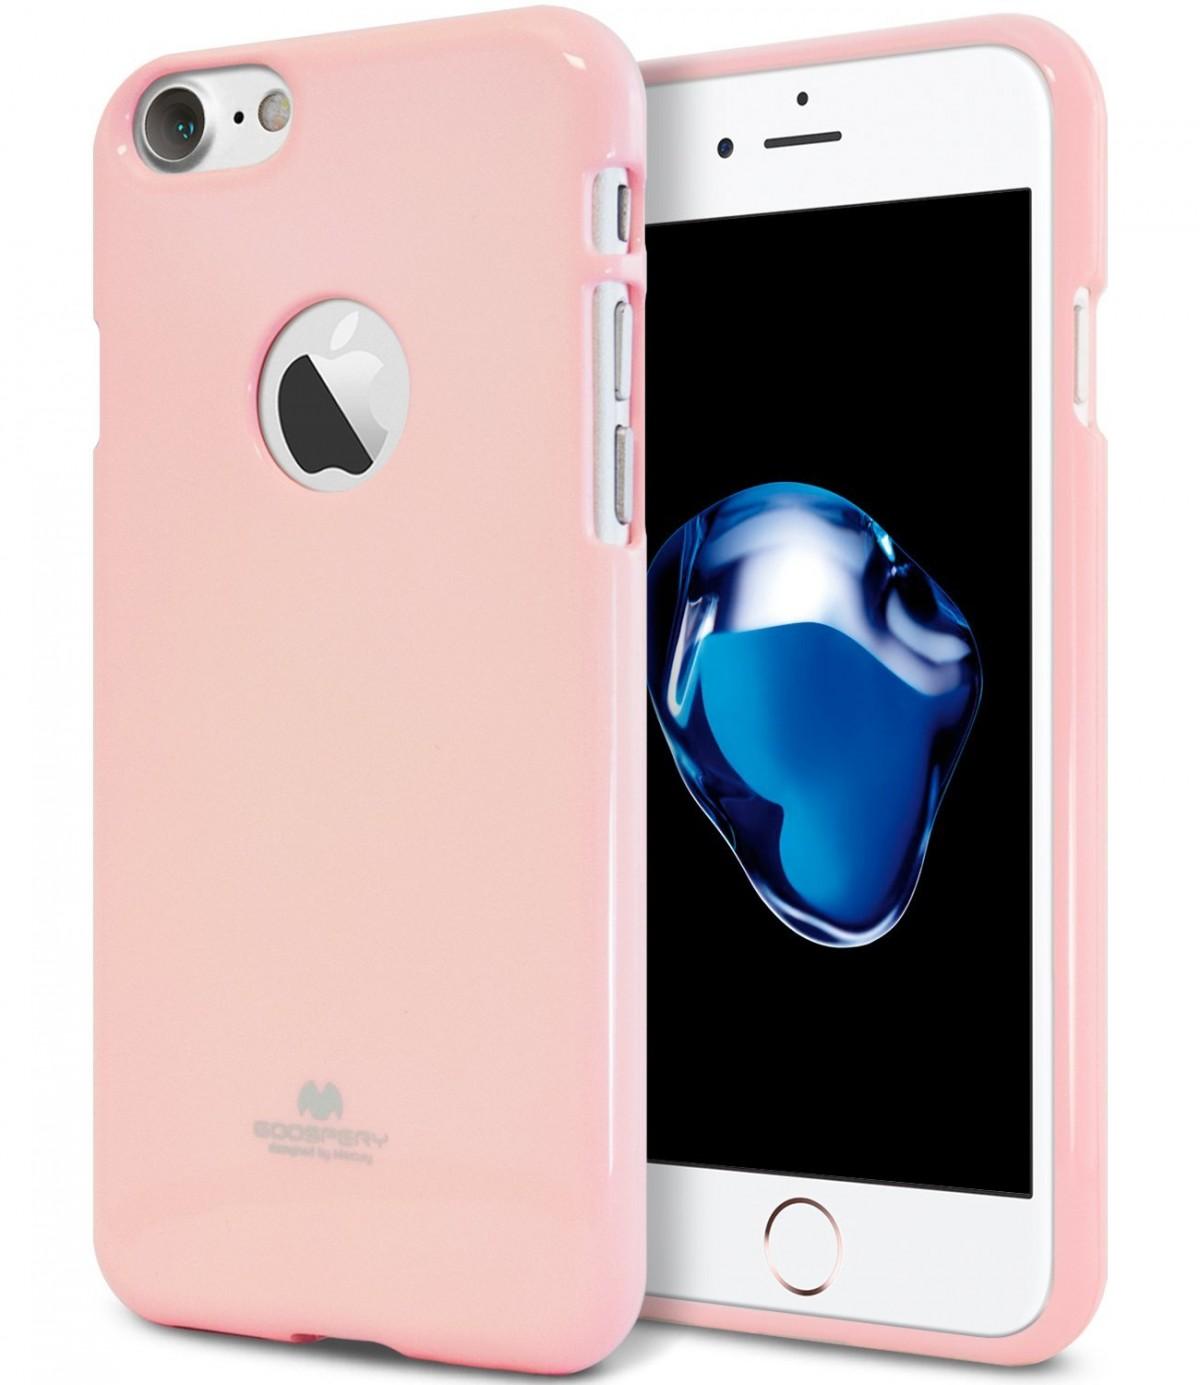 Pouzdro Mercury Jelly Case Apple iPhone 7 / 8 růžové